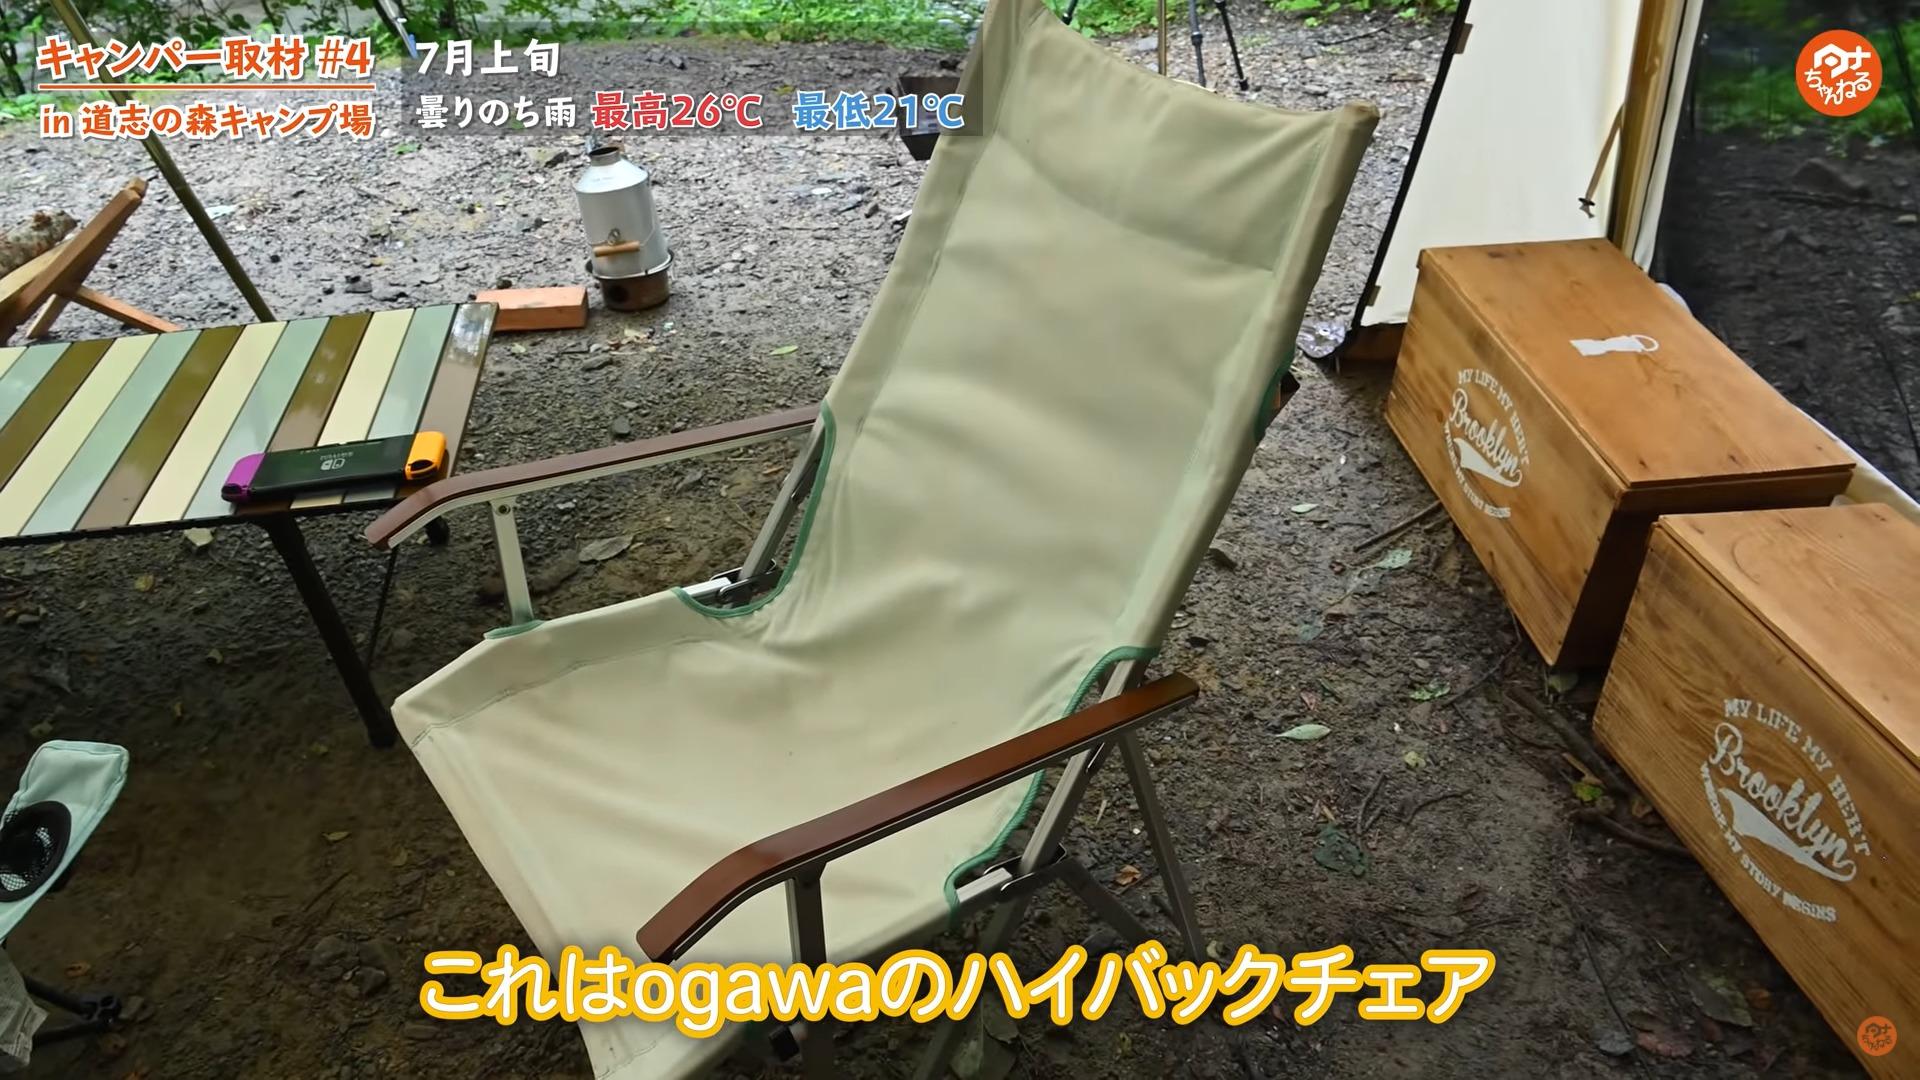 【ogawa(オガワ)】 ハイバックチェア